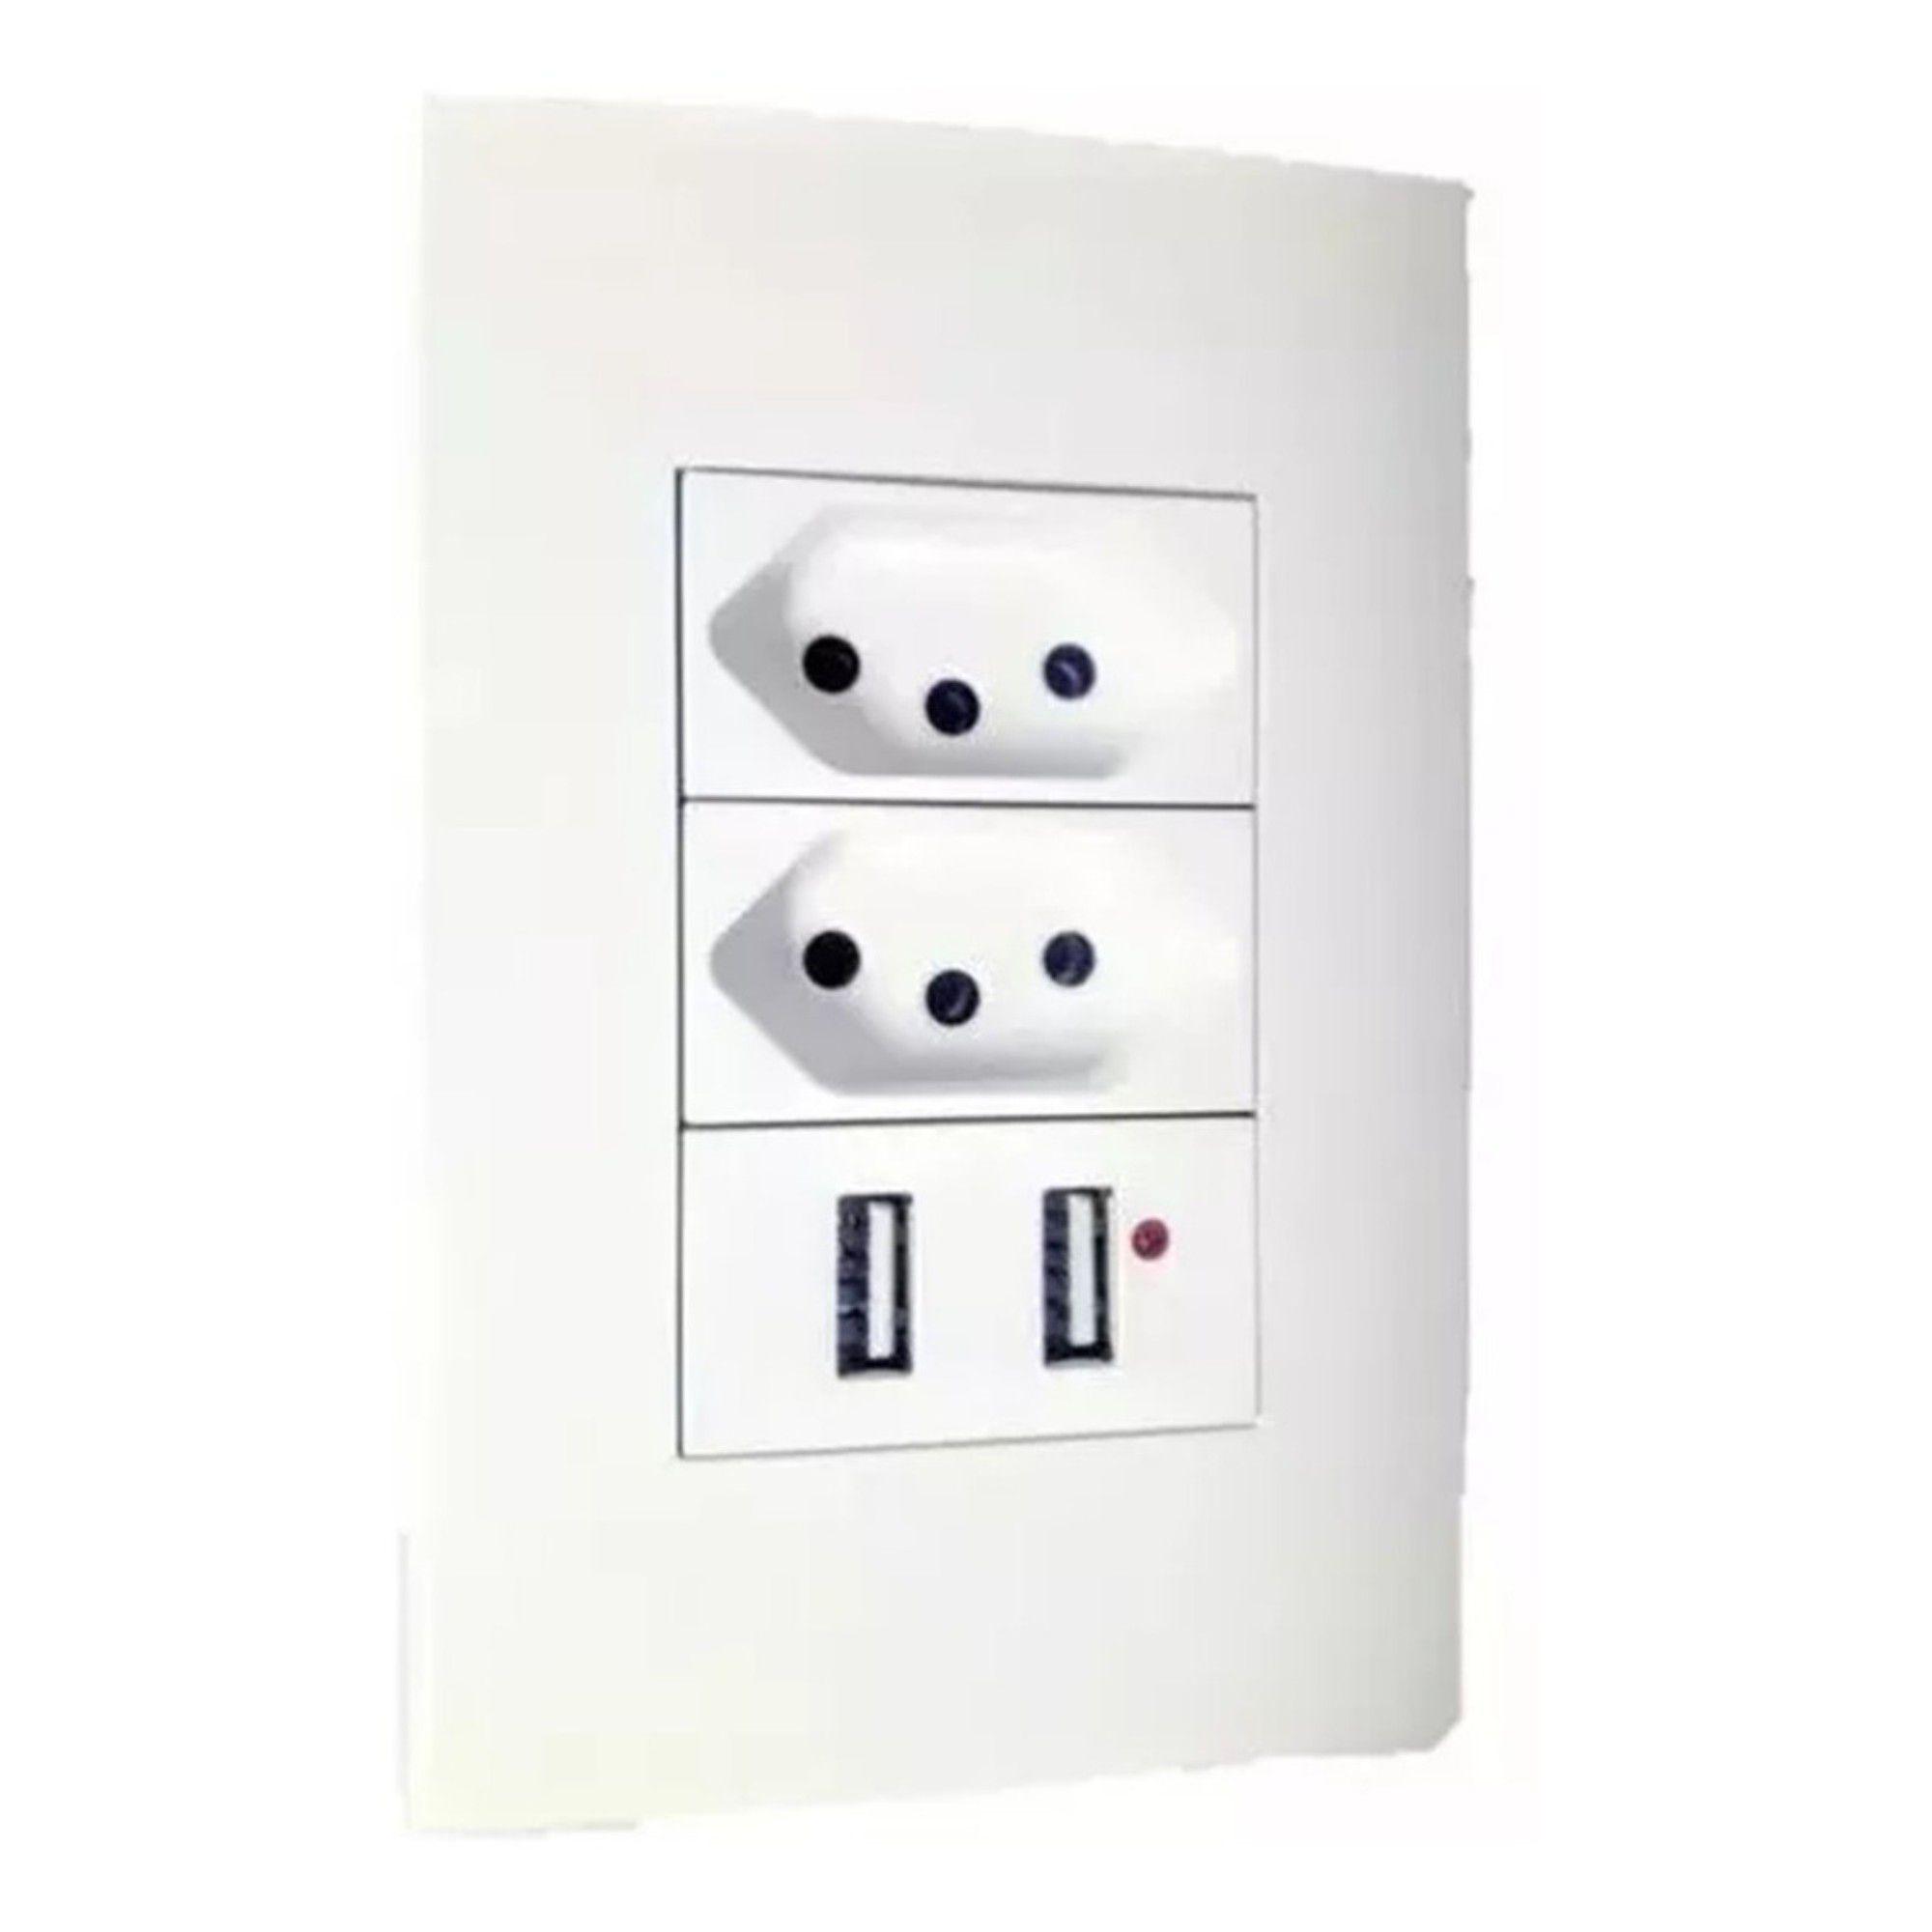 Tomada de Parede 4x2 C/ Usb Duo 1 Interruptor 1 Tomada 2 Usb